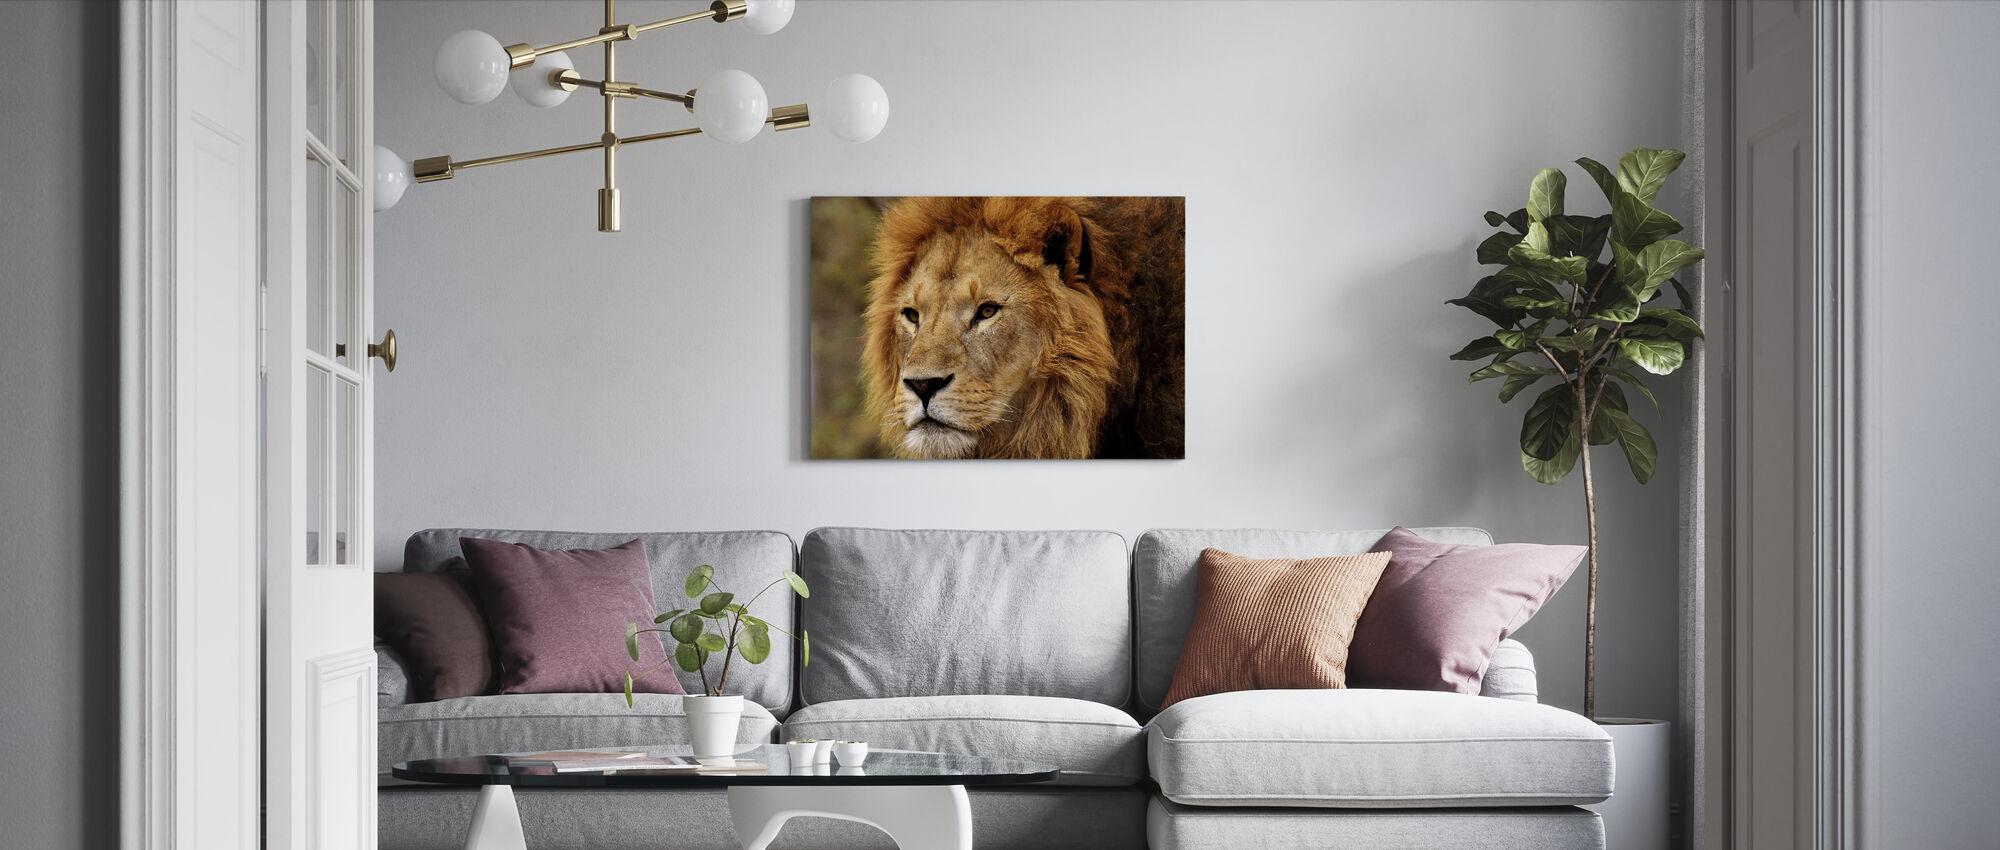 Lion Staring - Canvas print - Living Room